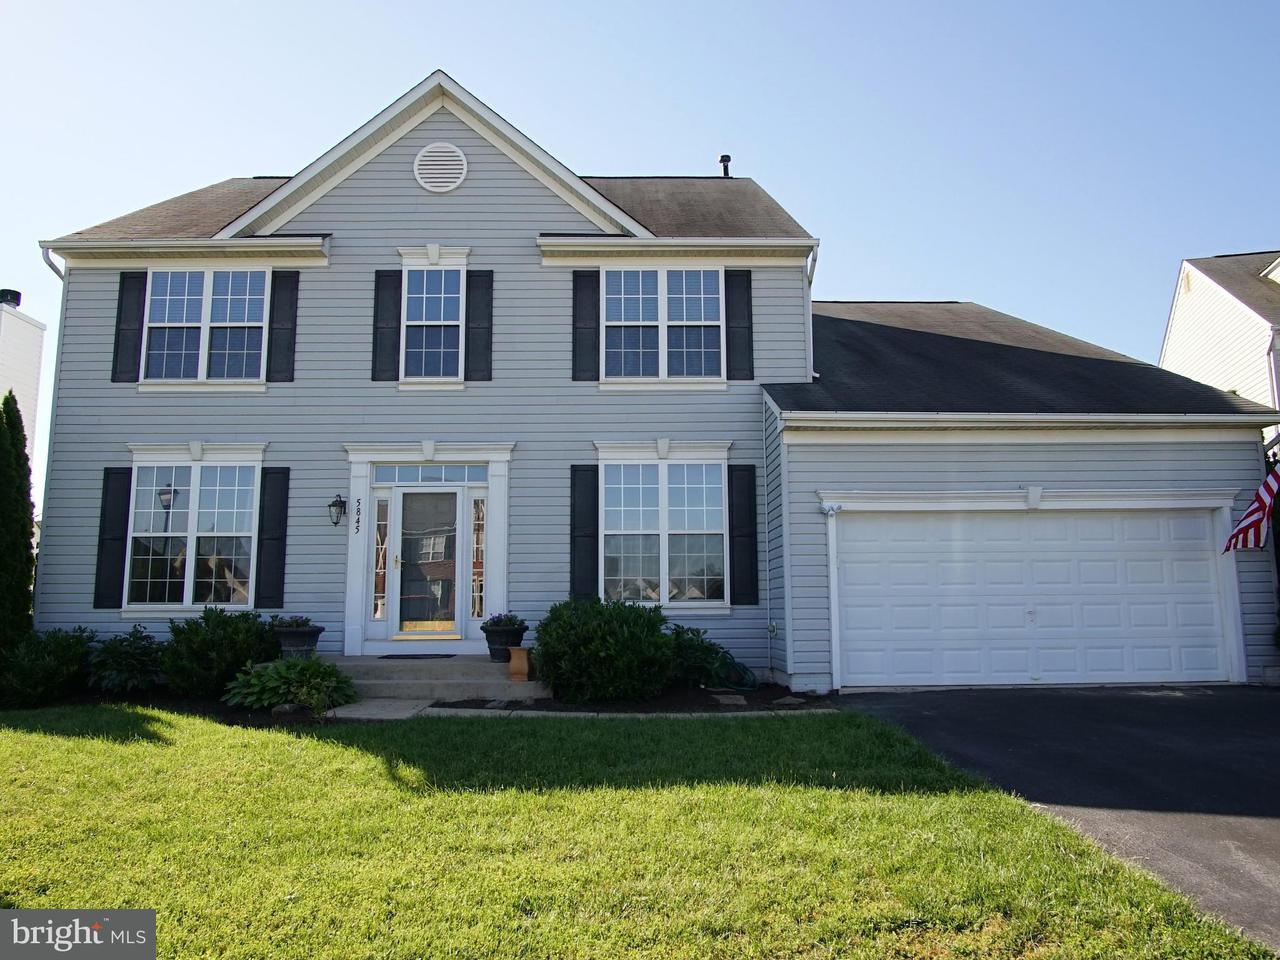 Casa Unifamiliar por un Venta en 5845 BOTTLEBRUSH Court 5845 BOTTLEBRUSH Court New Market, Maryland 21774 Estados Unidos